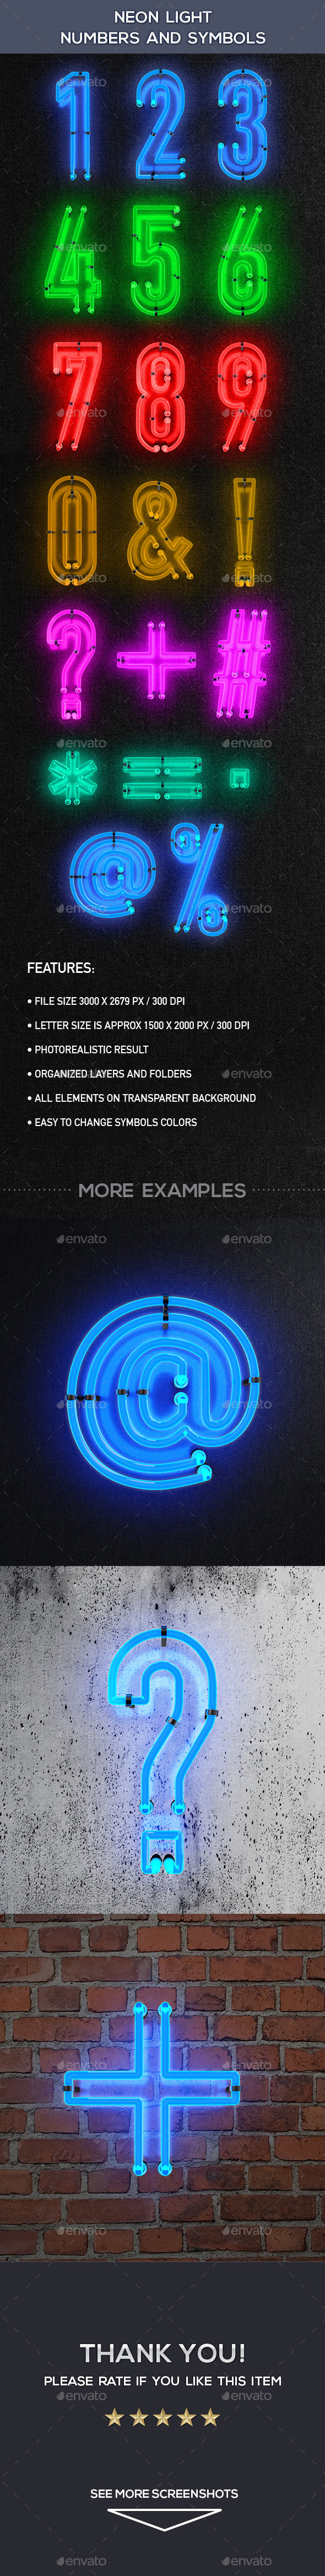 Neon Light Numbers And Symbols - Decorative Symbols Decorative